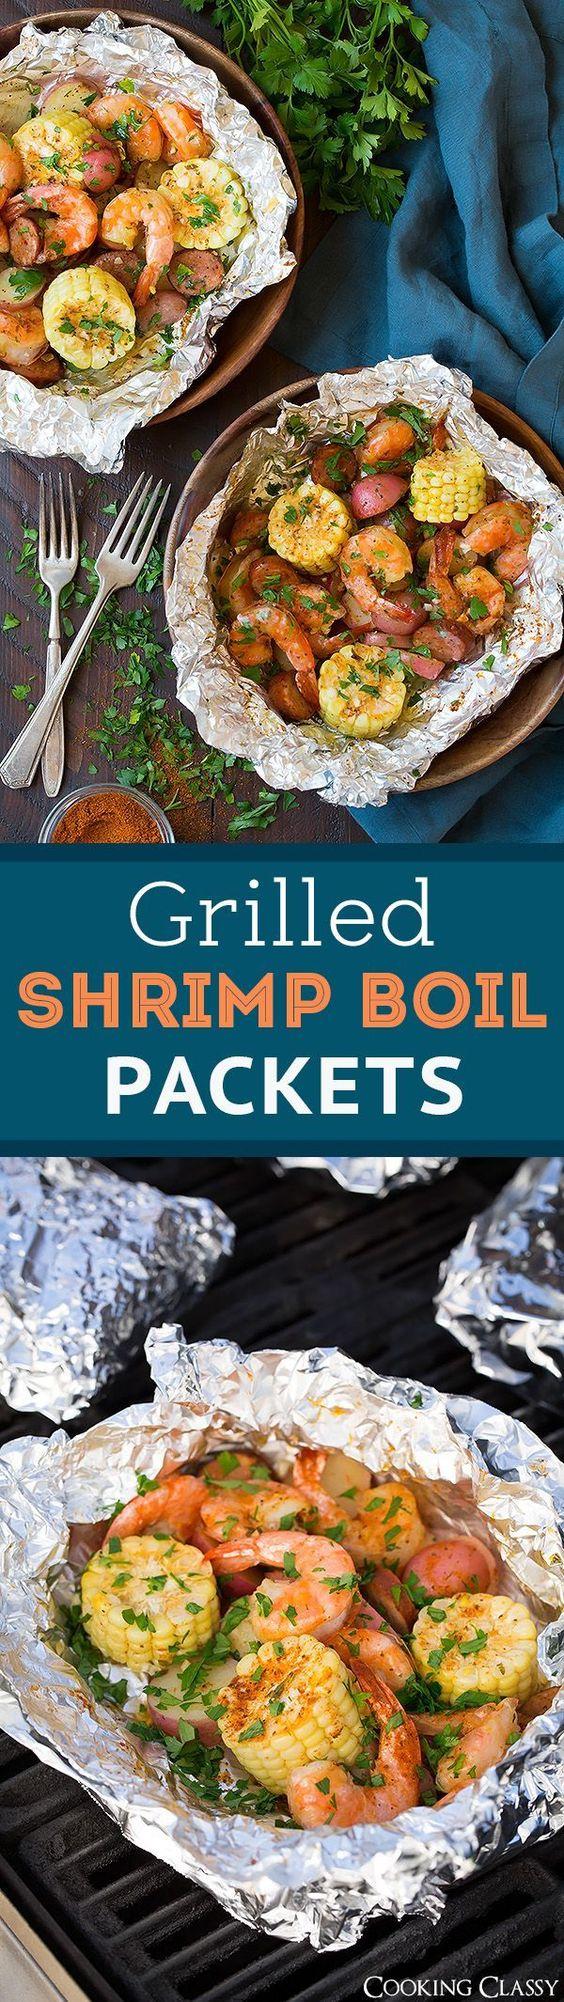 Grilled shrimp, Shrimp and Dinner on Pinterest